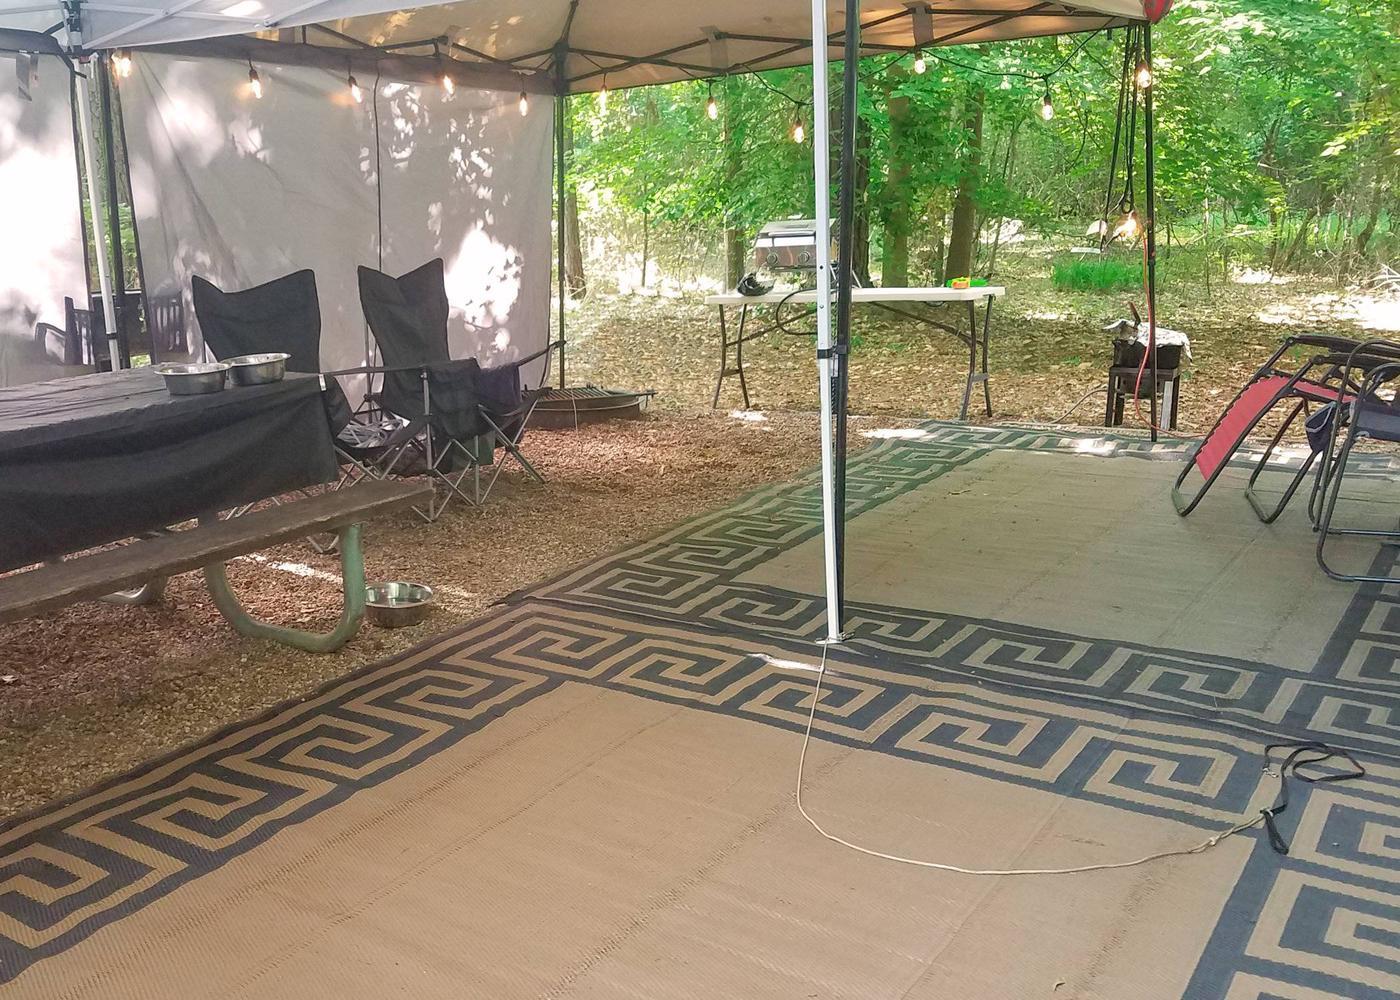 Campsite view.Victoria Campground, campsite 02.